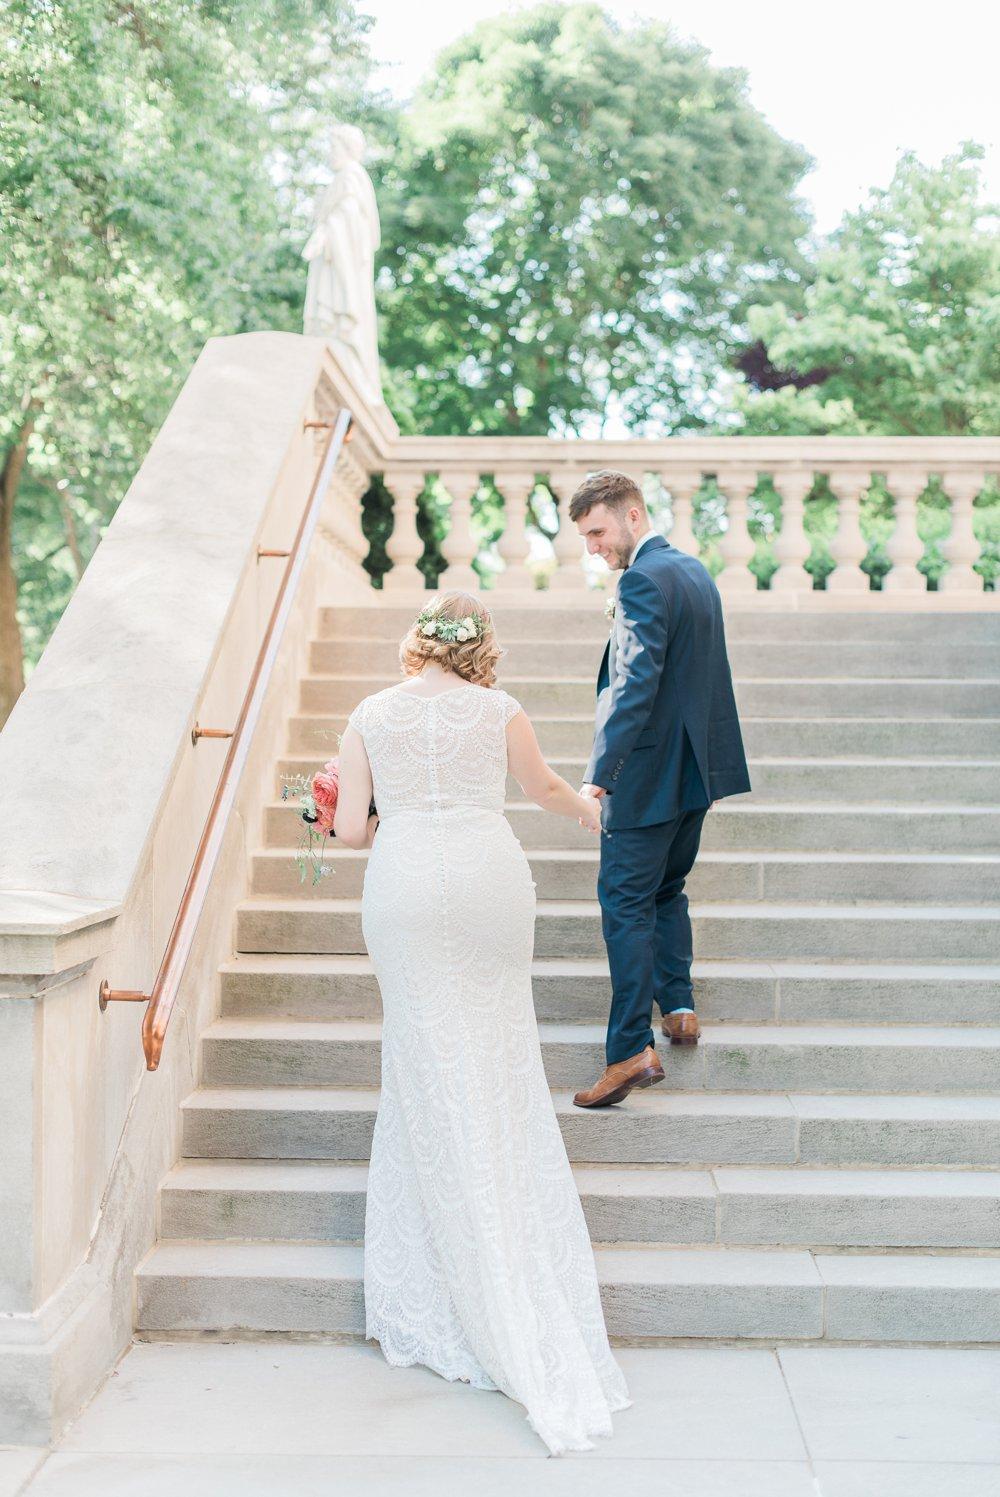 marietta-ohio-wedding-adelphia-music-hall-st-mary-basillica_0211.jpg